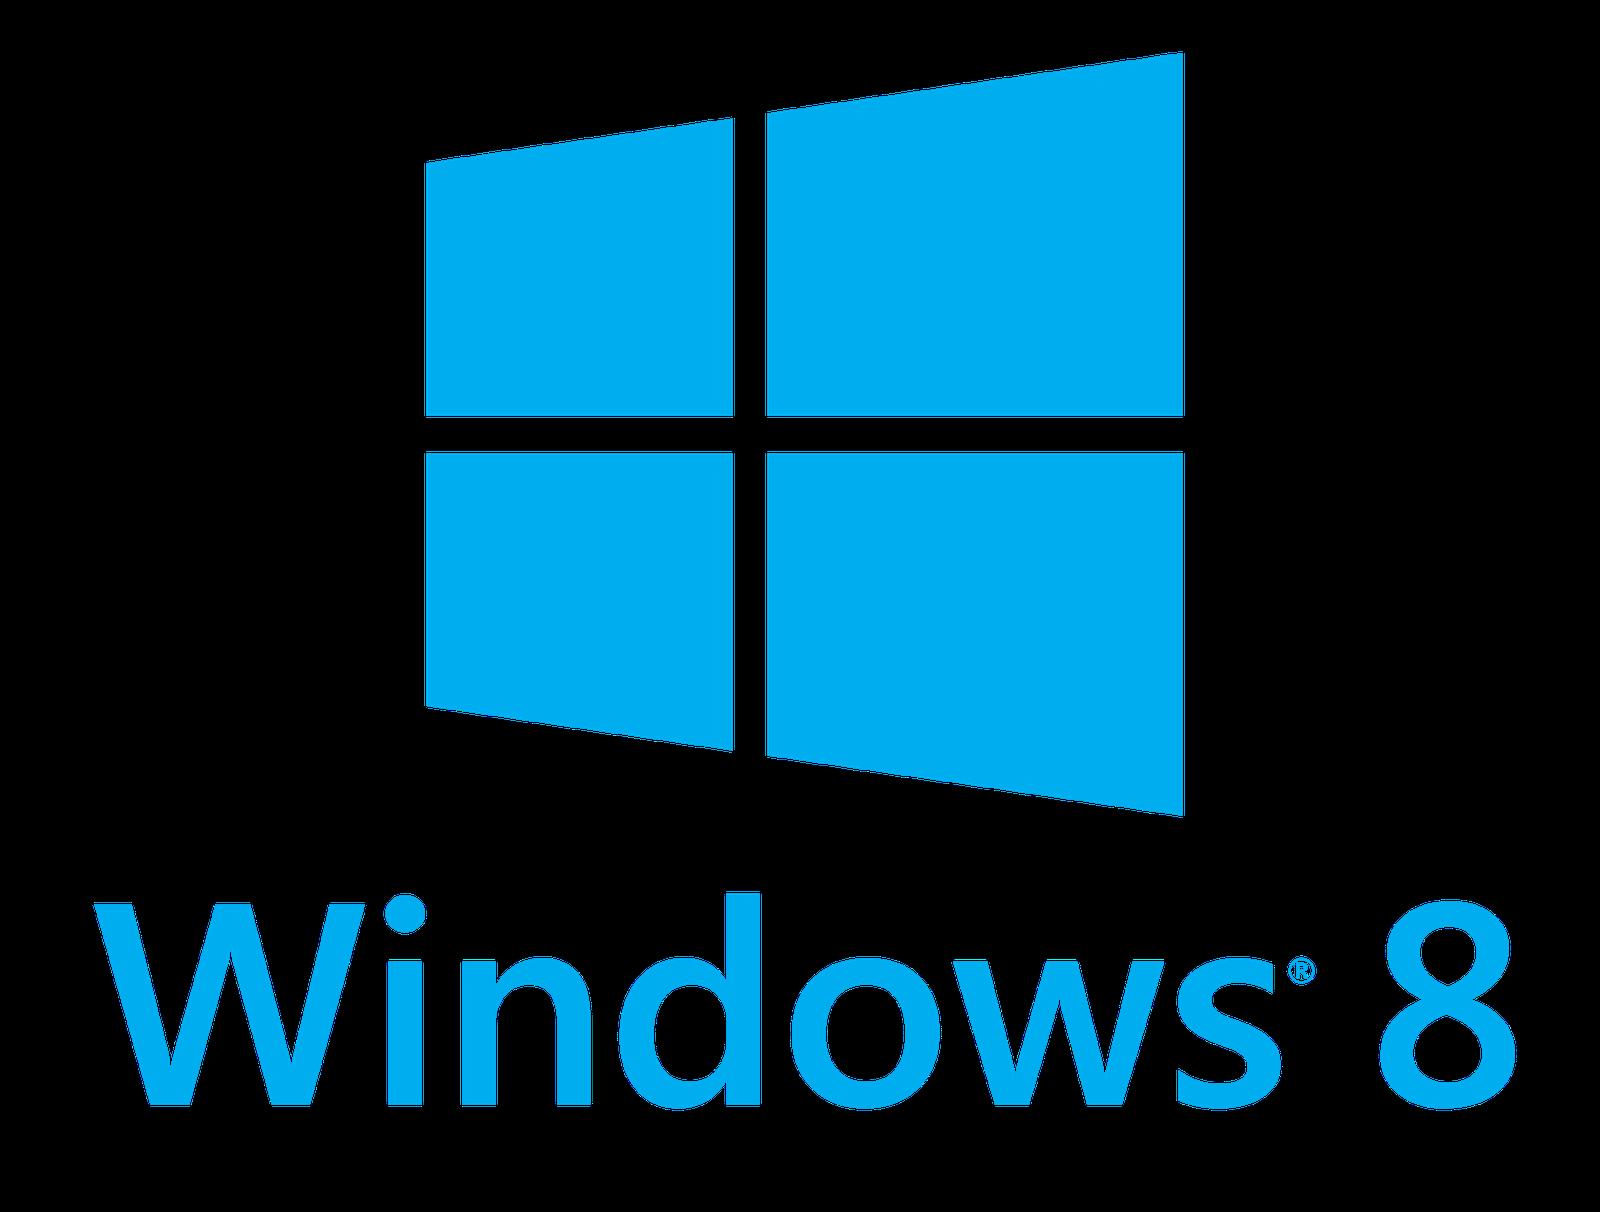 https://www.windowscentral.com/how-upgrade-32-bit-64-bit-version-windows-10